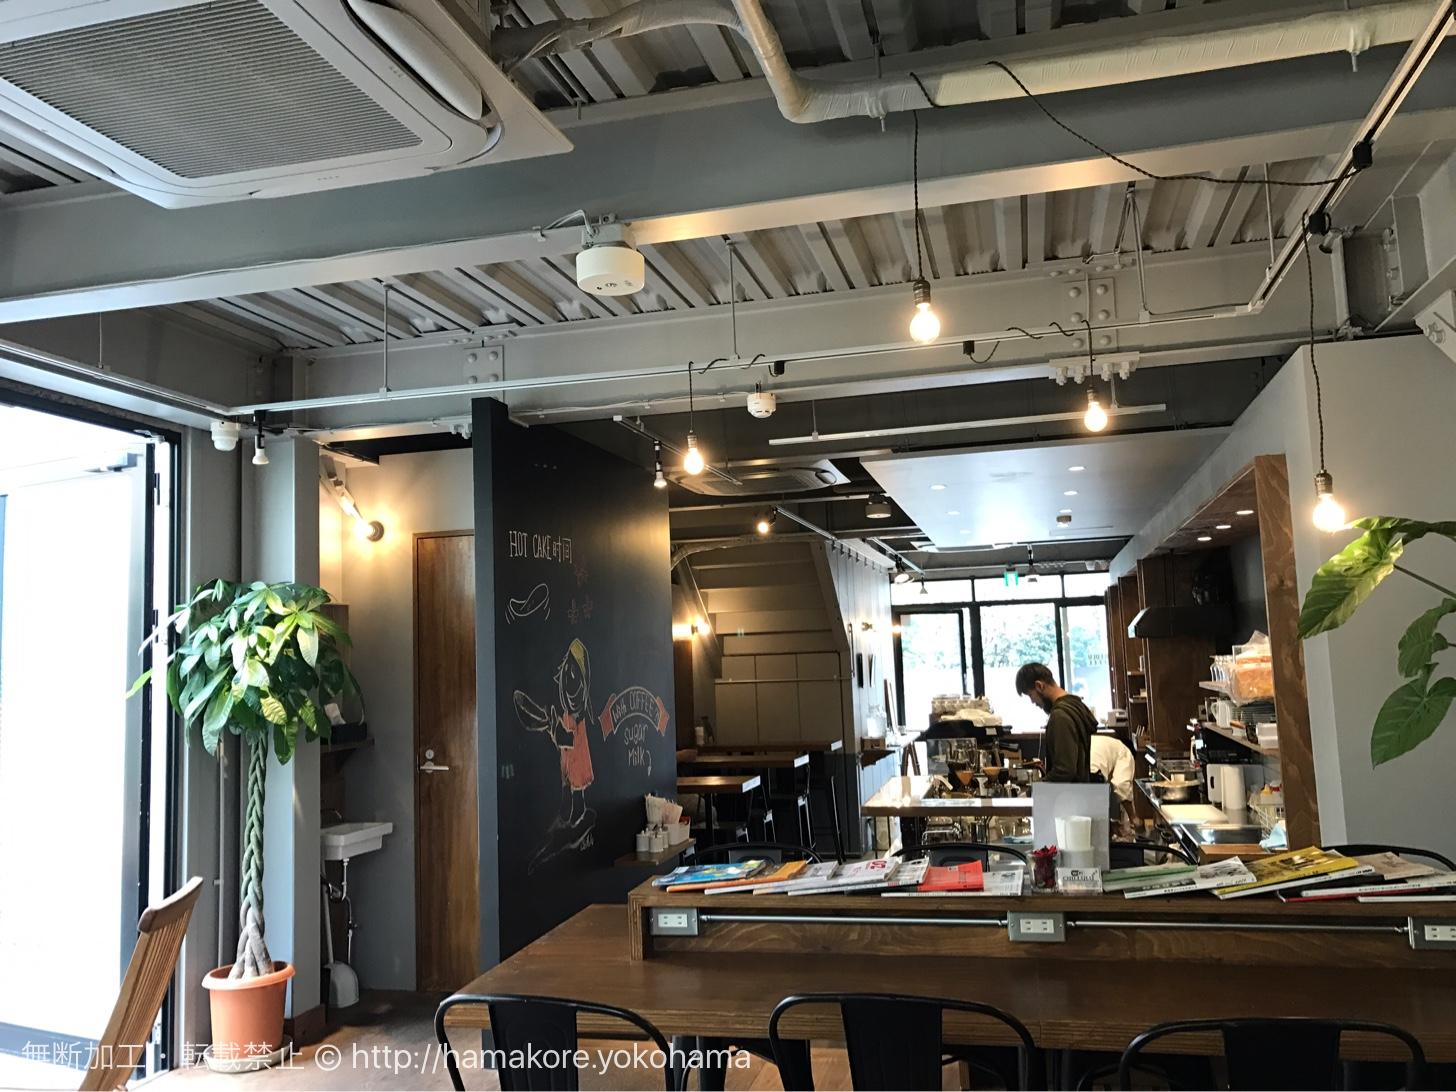 CHILLULU COFFEE 店内